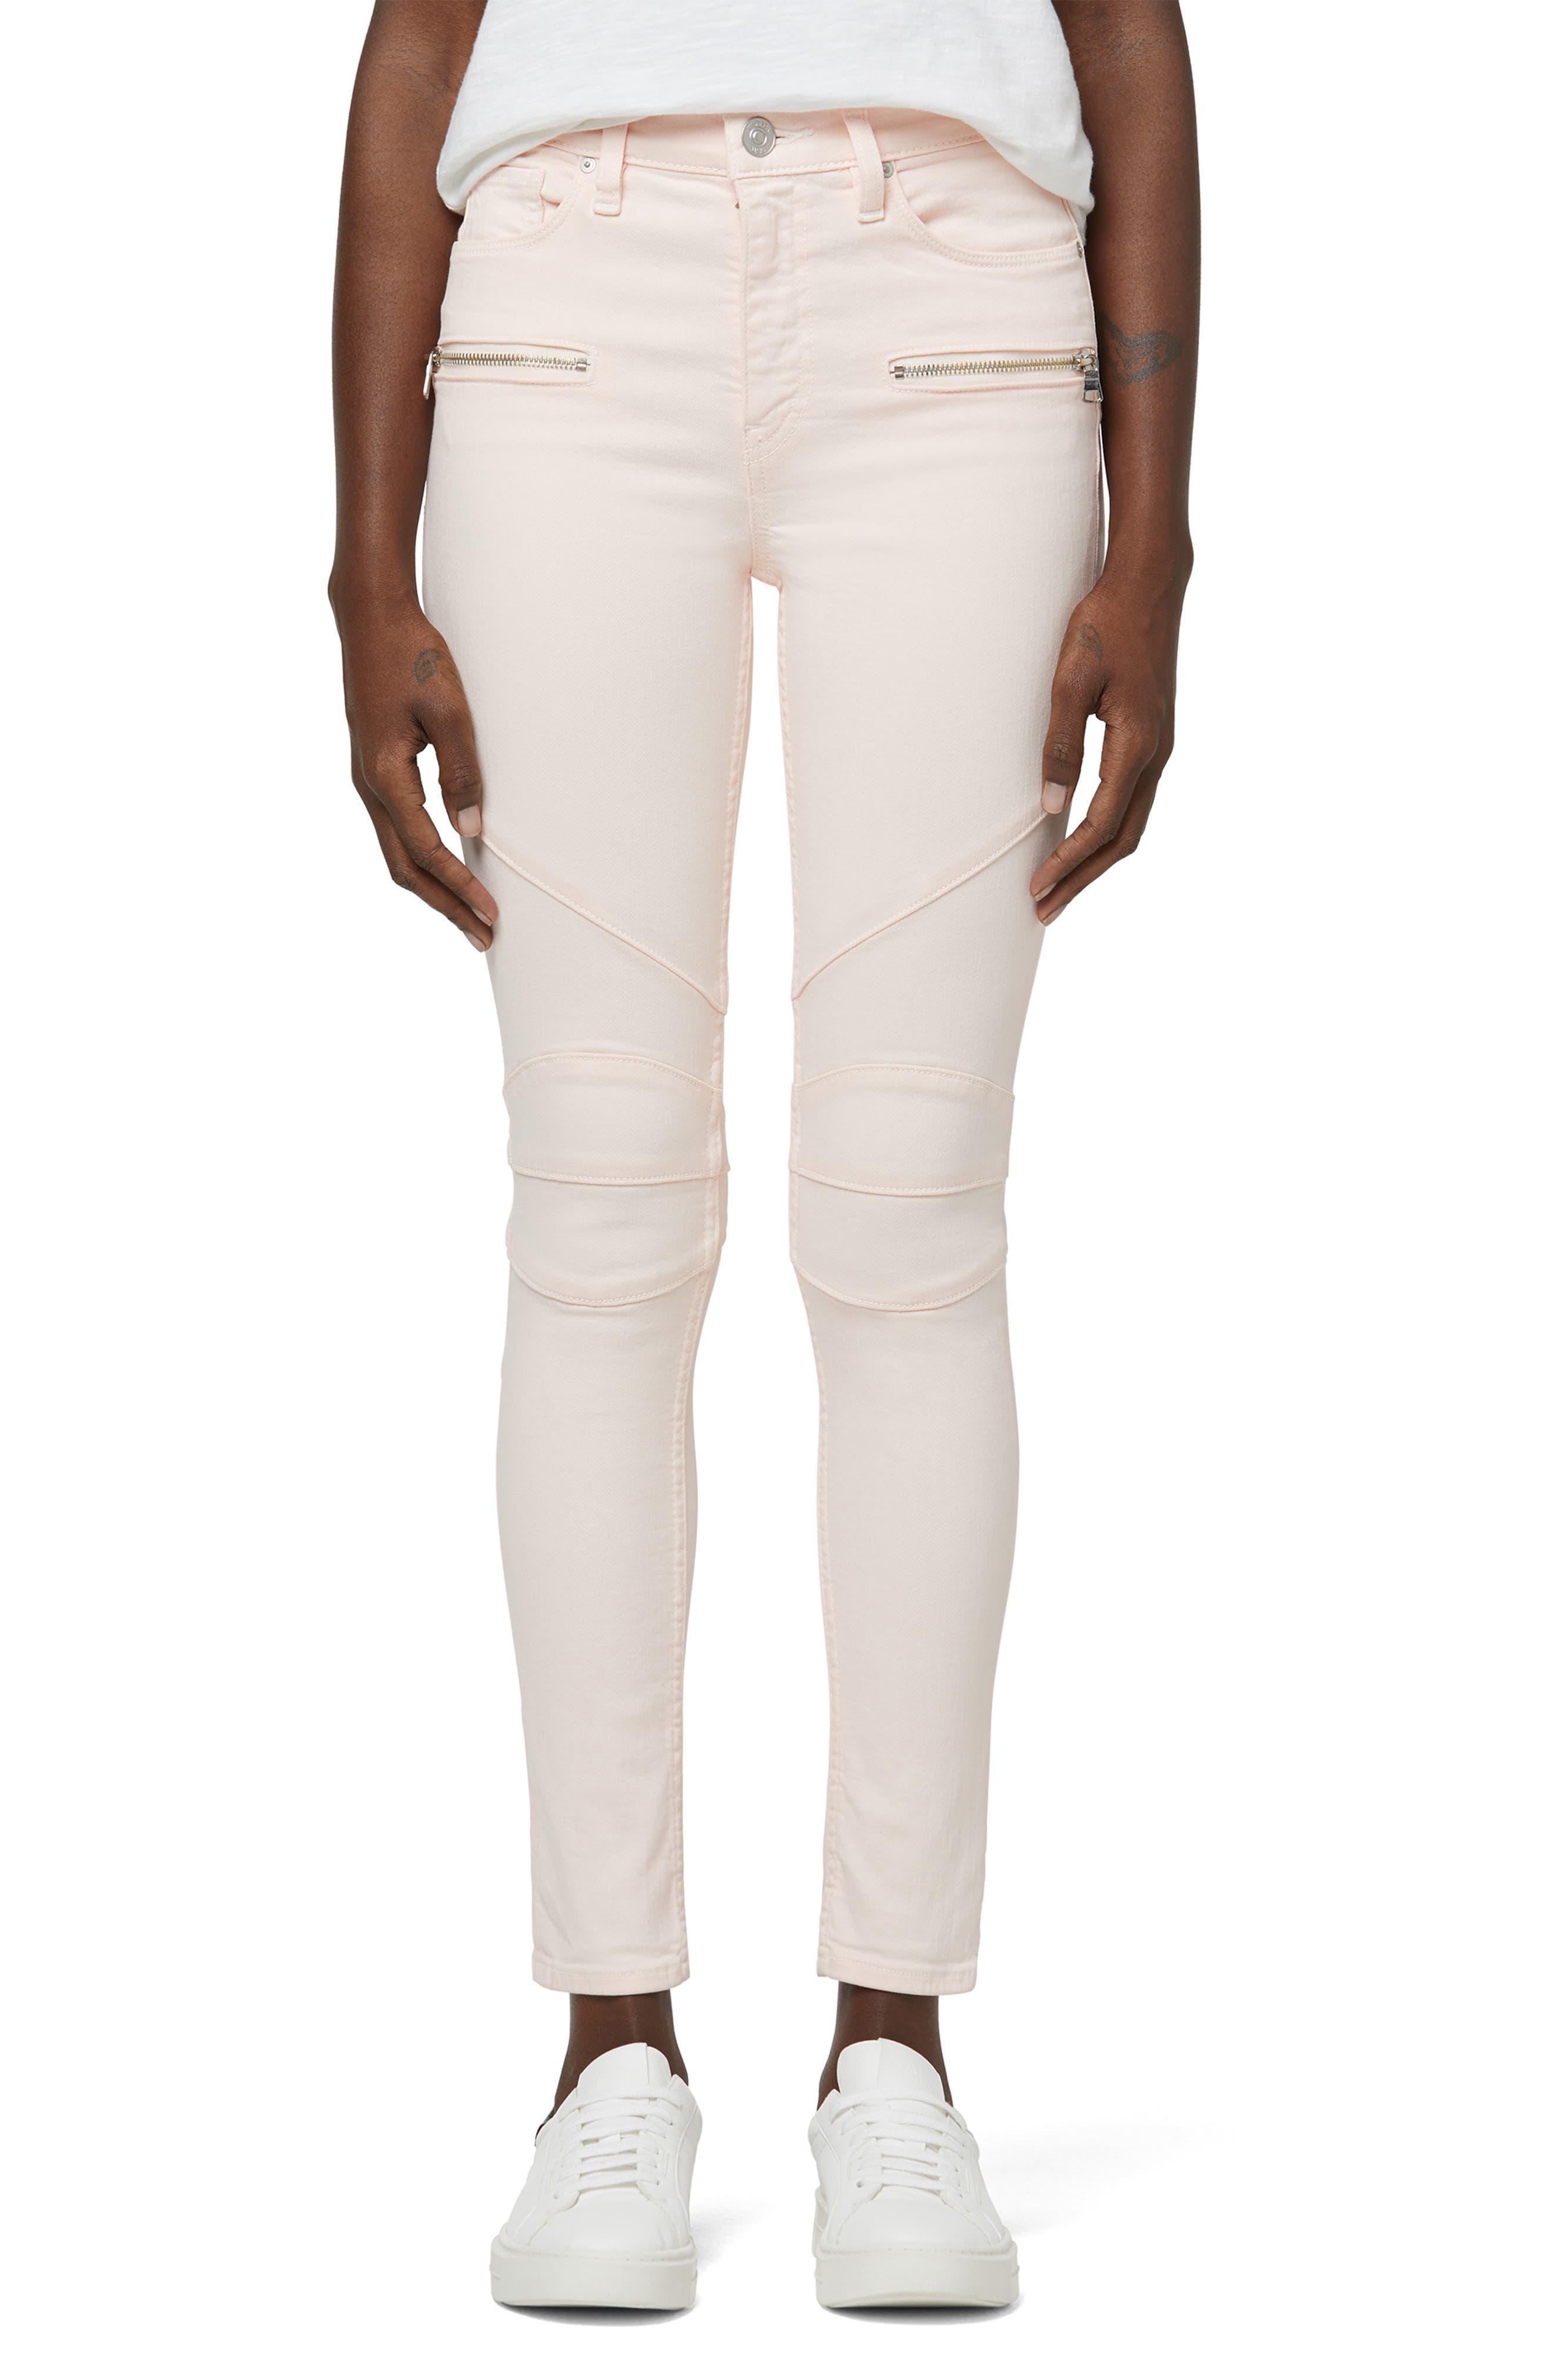 Barbara Moto High Waist Stretch Ankle Skinny Jeans